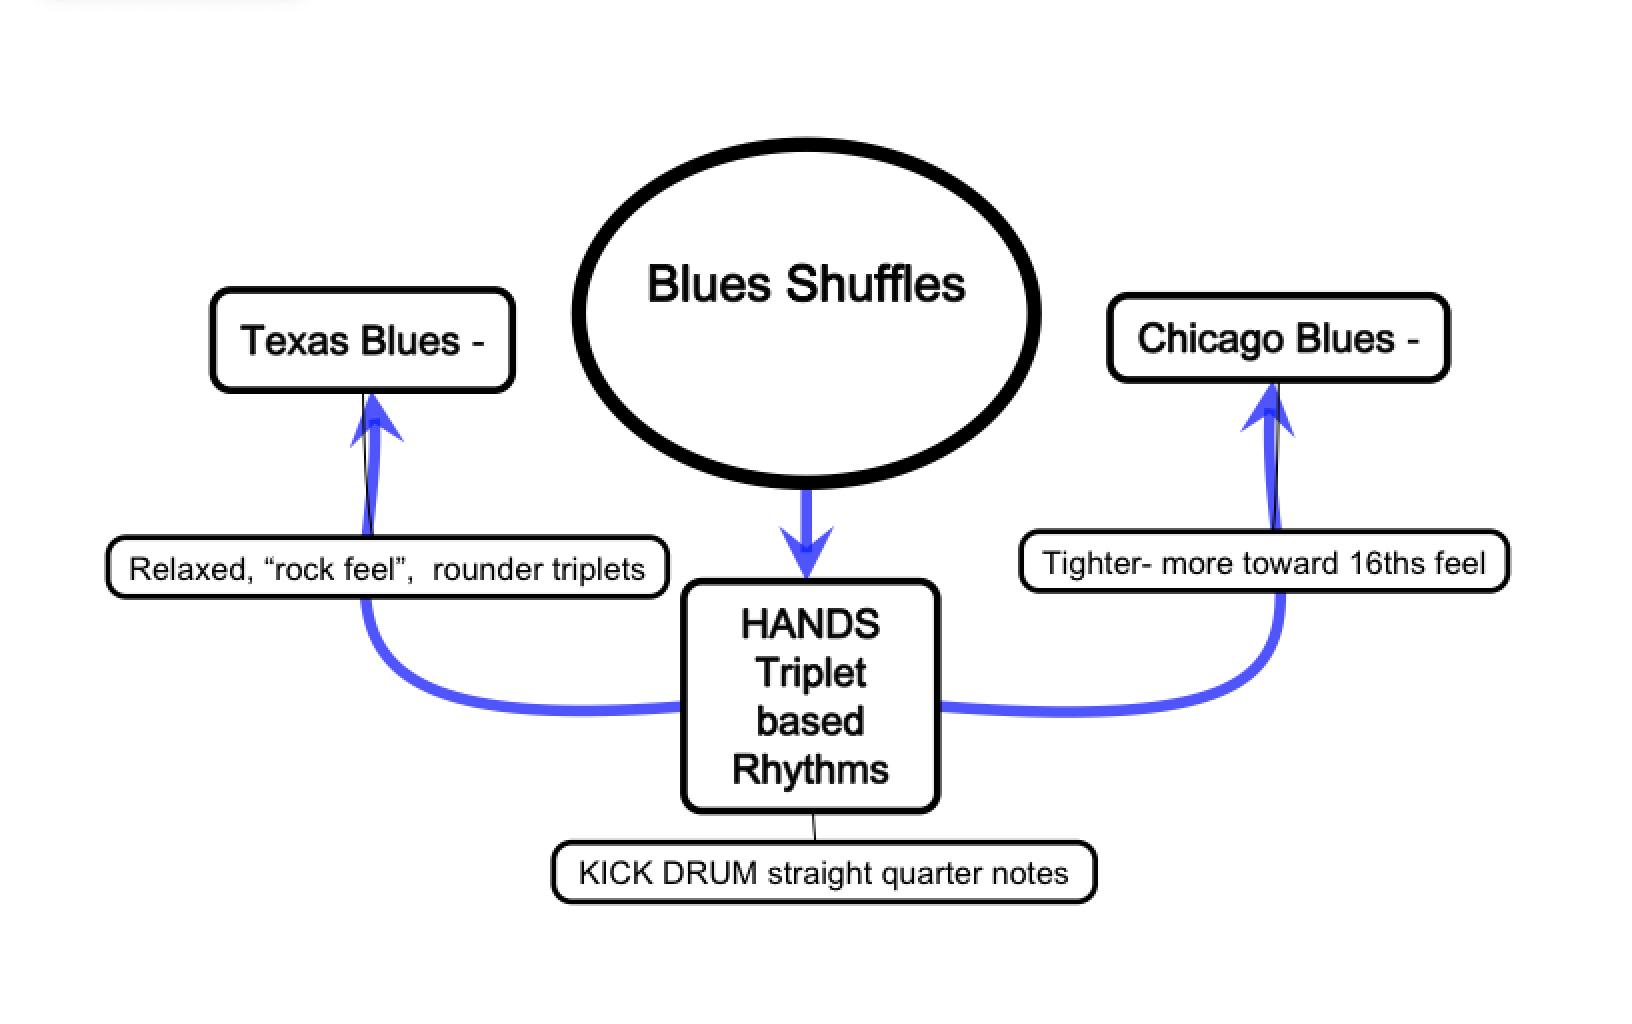 Blues Shuffle Beat Structure